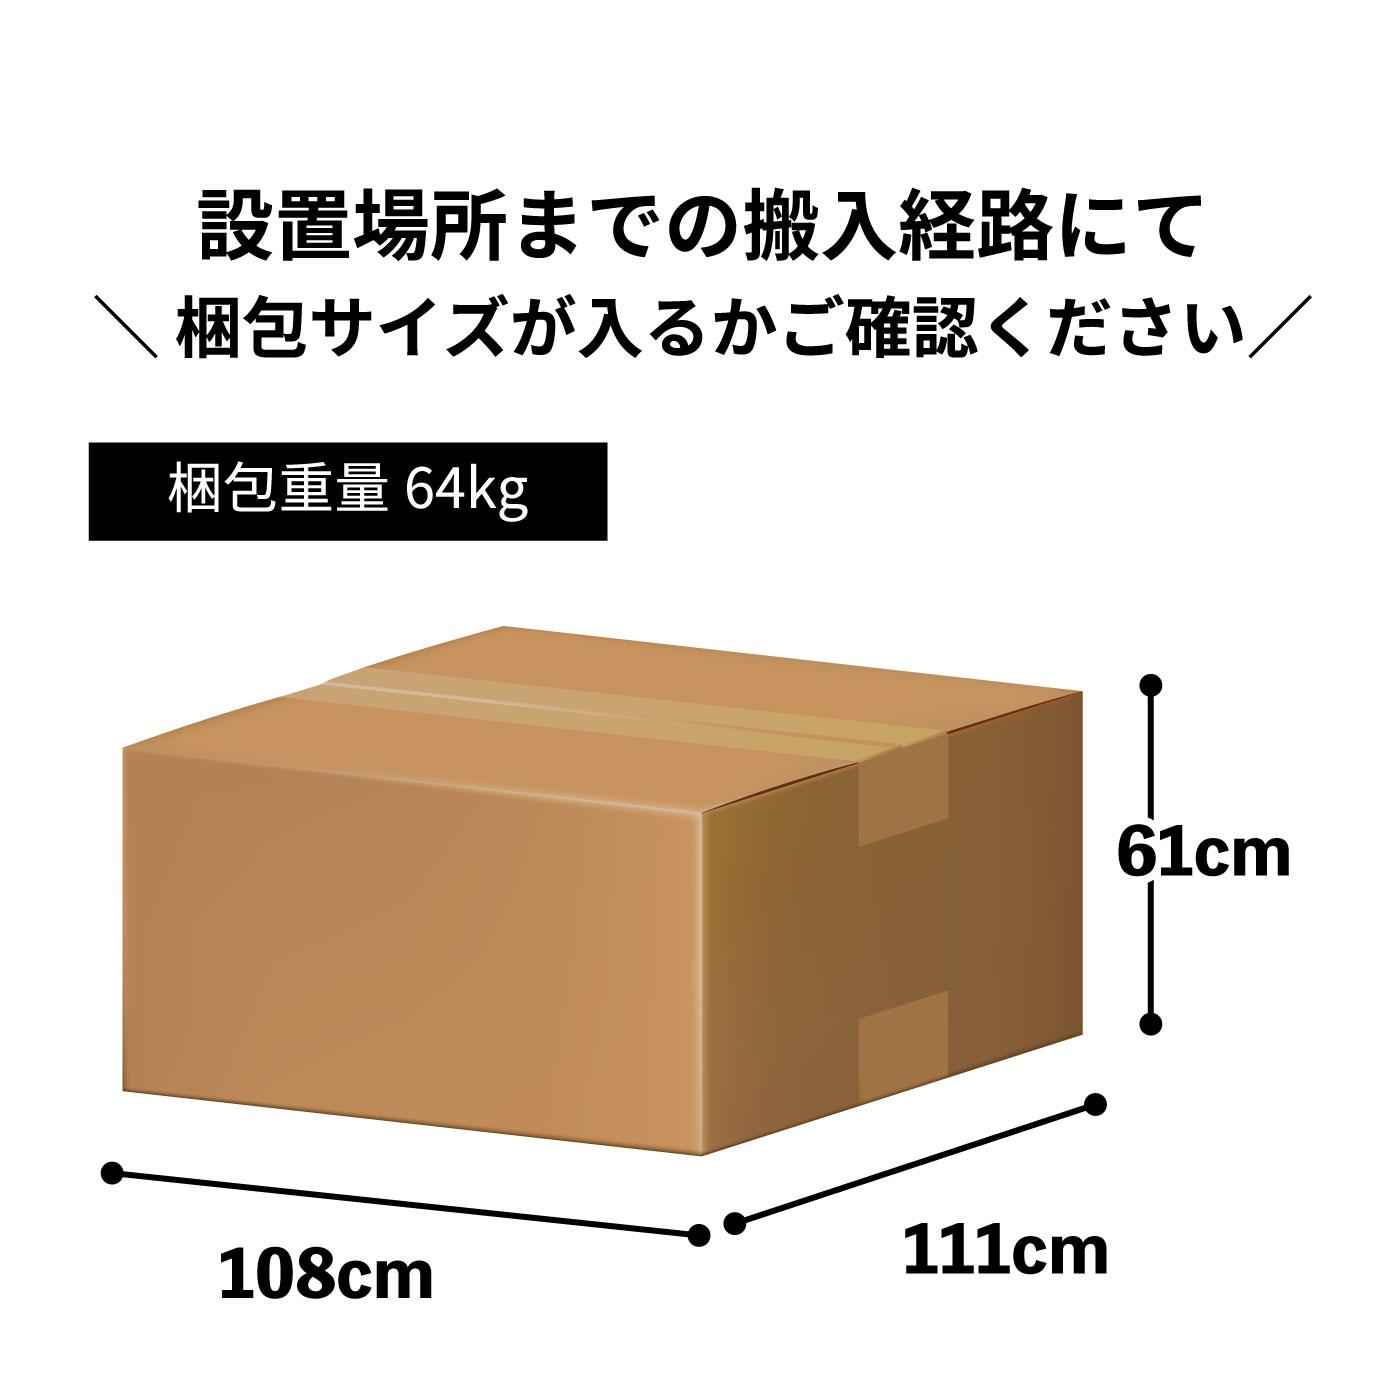 DK-1205の梱包サイズ